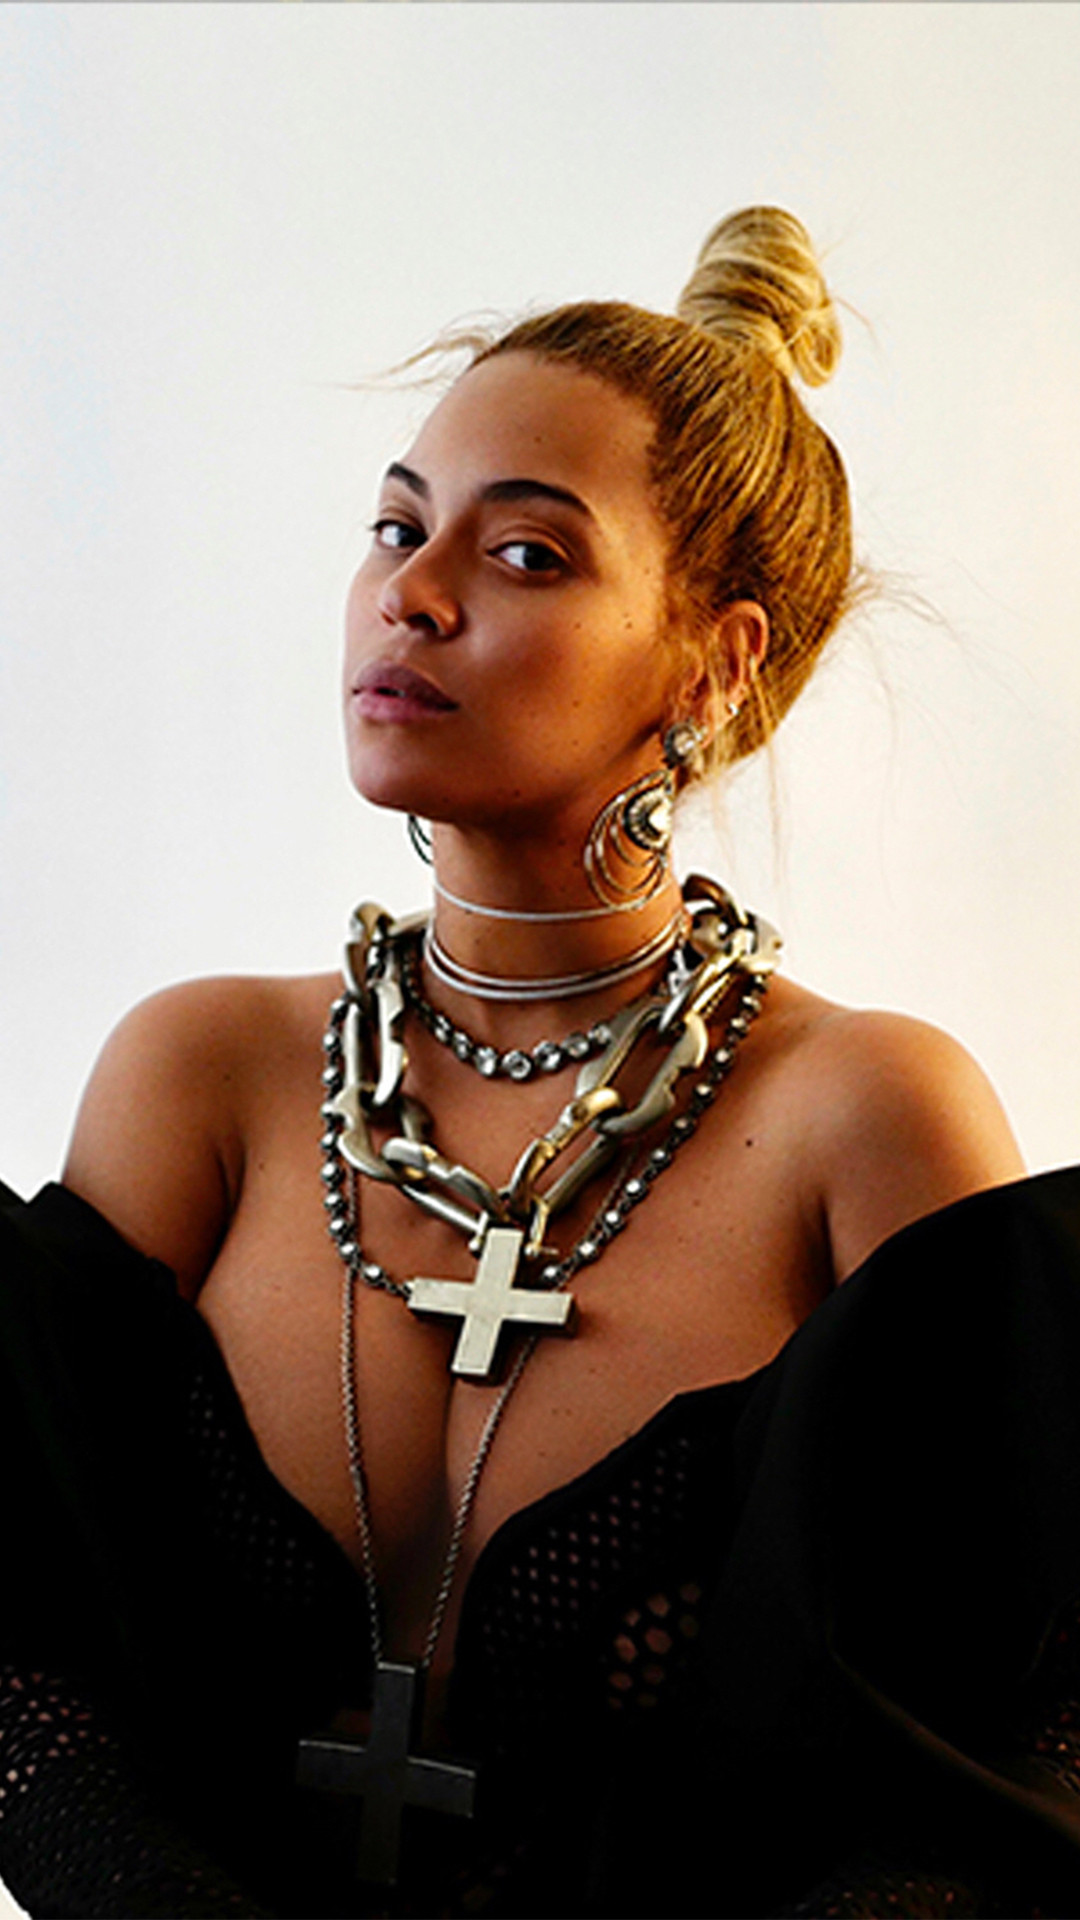 Beyoncé, Eminem and The Weeknd to Headline Coachella 2018 ... Beyonce